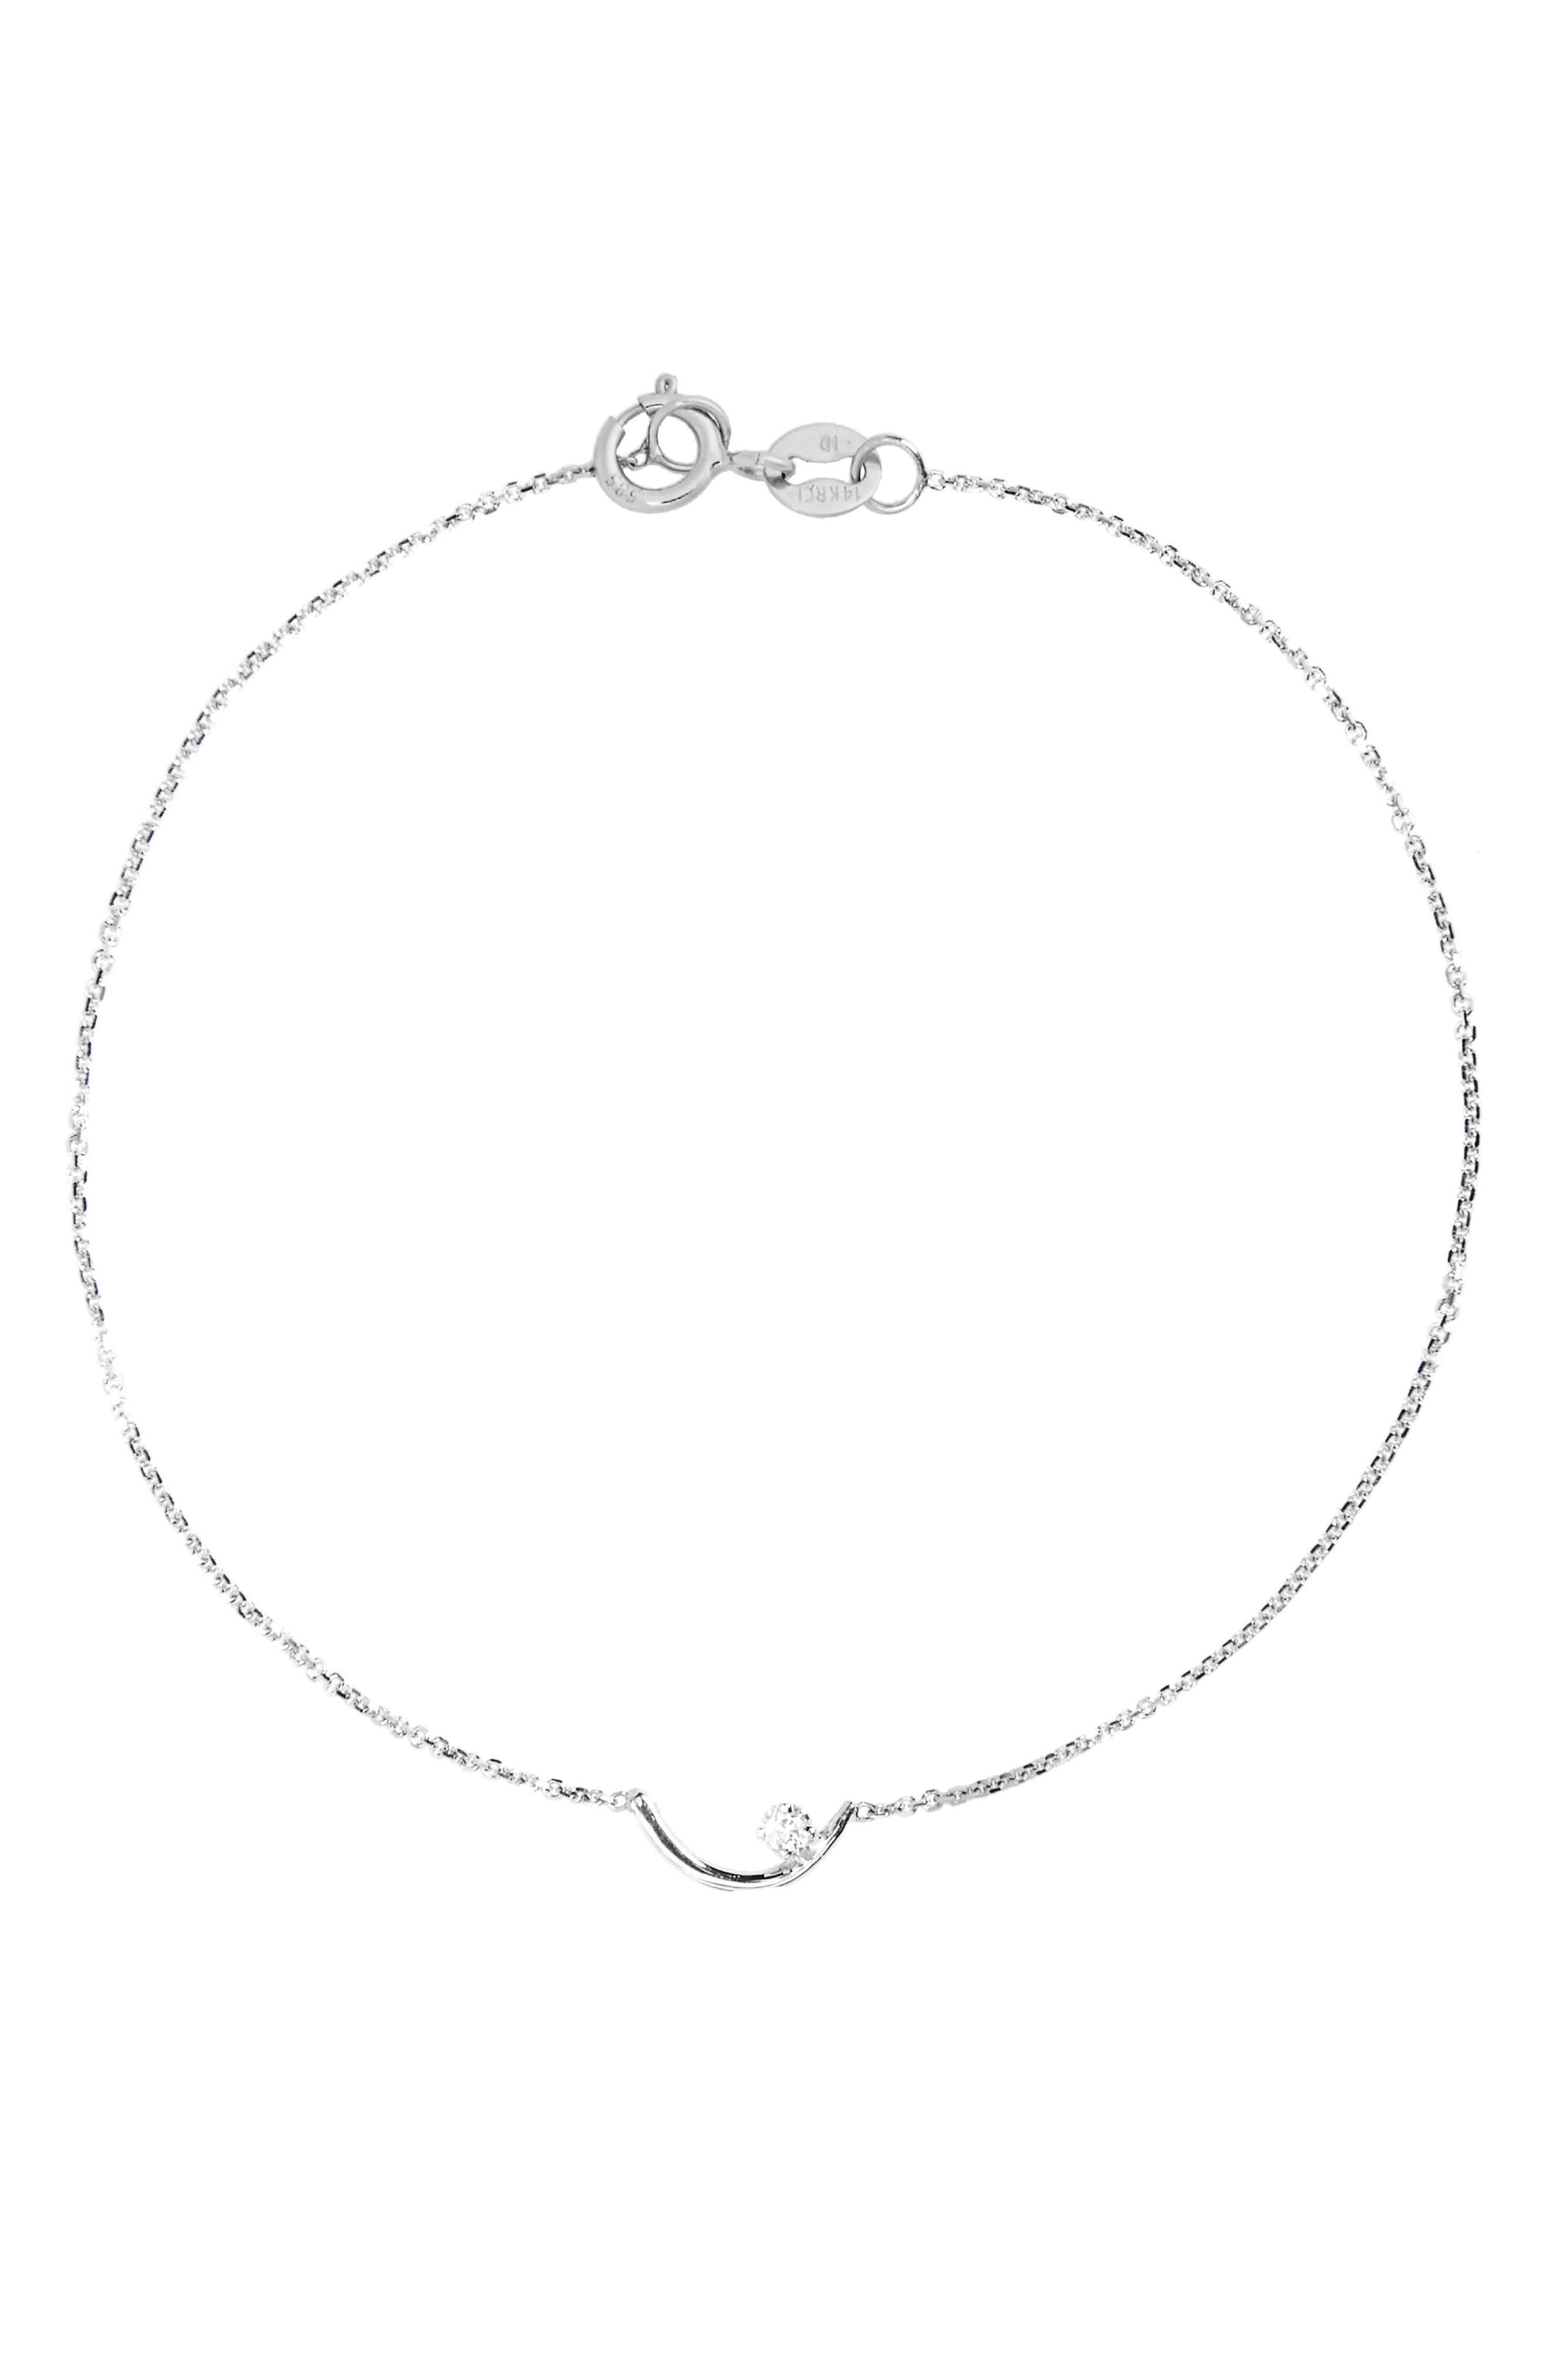 Arc Lineage Diamond Bracelet,                         Main,                         color, STERLING SILVER/ WHITE DIAMOND